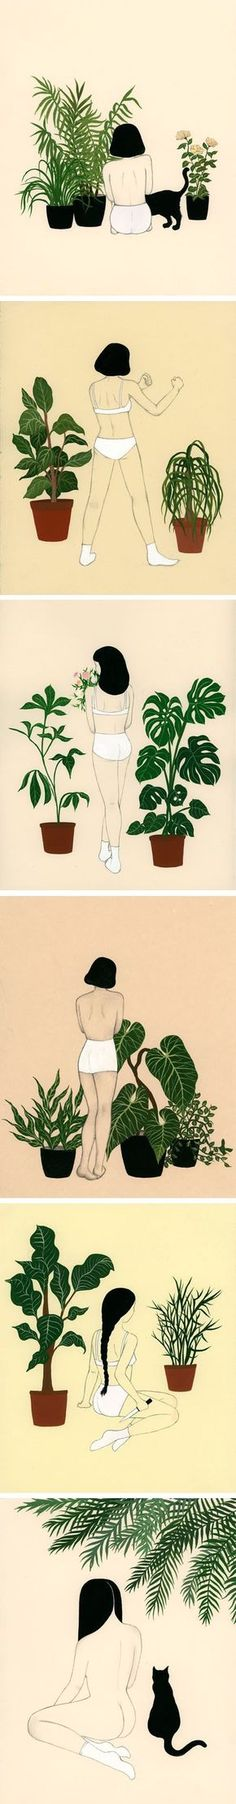 Dan-ah Kim on the LPP blog. all images via the artist.